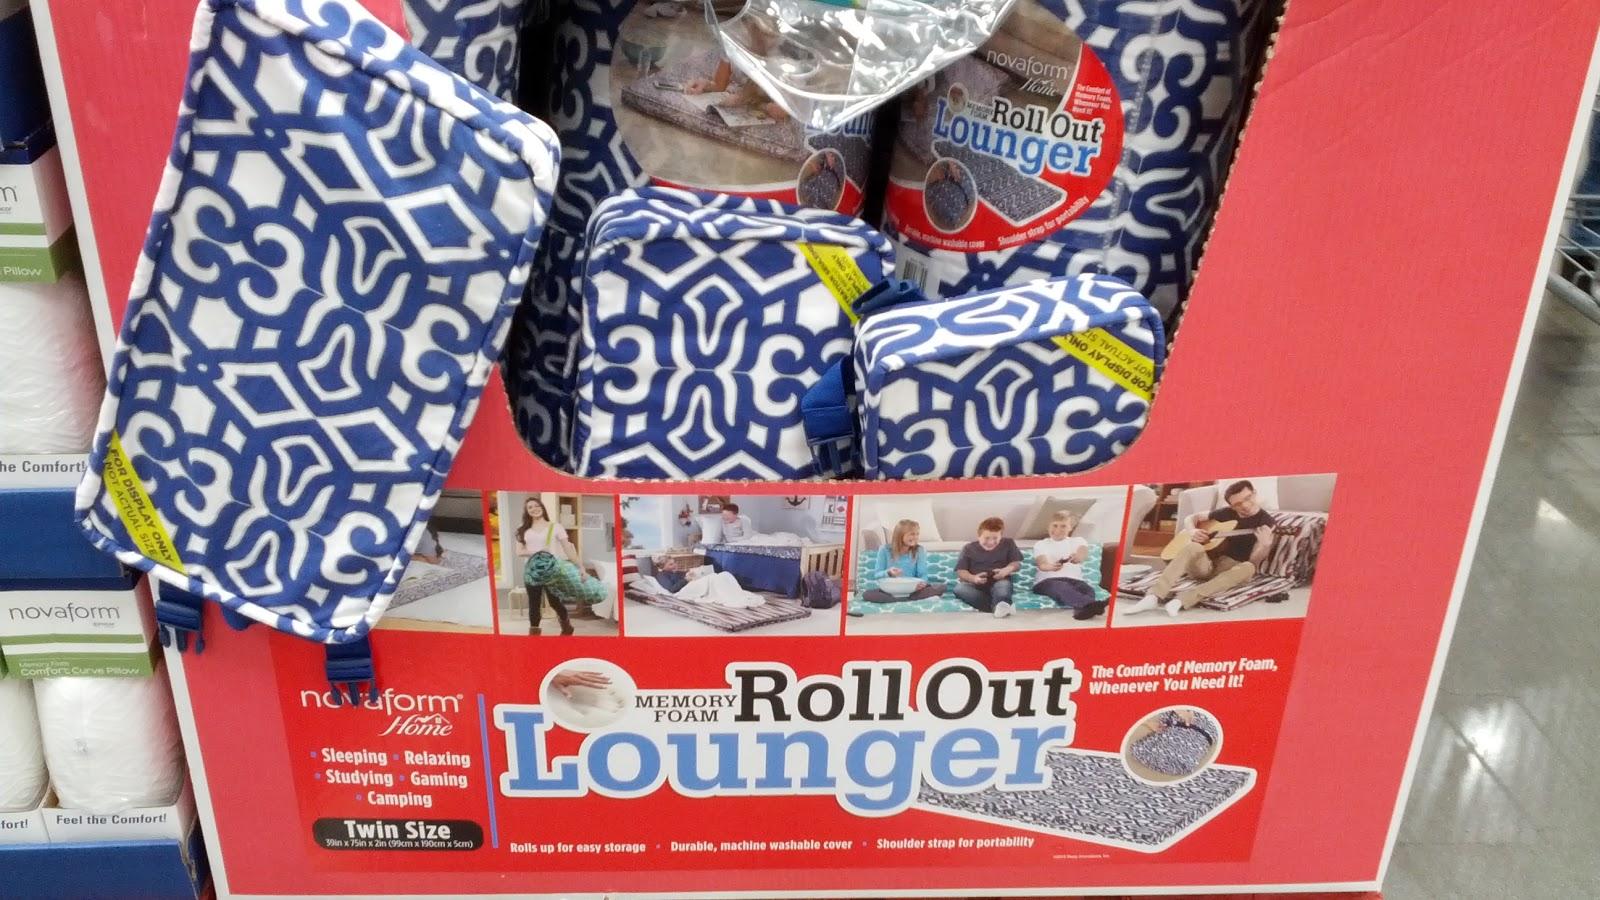 Novaform Kitchen Mat Valances Ideas Home Roll Out Memory Foam Lounger   Costco Weekender